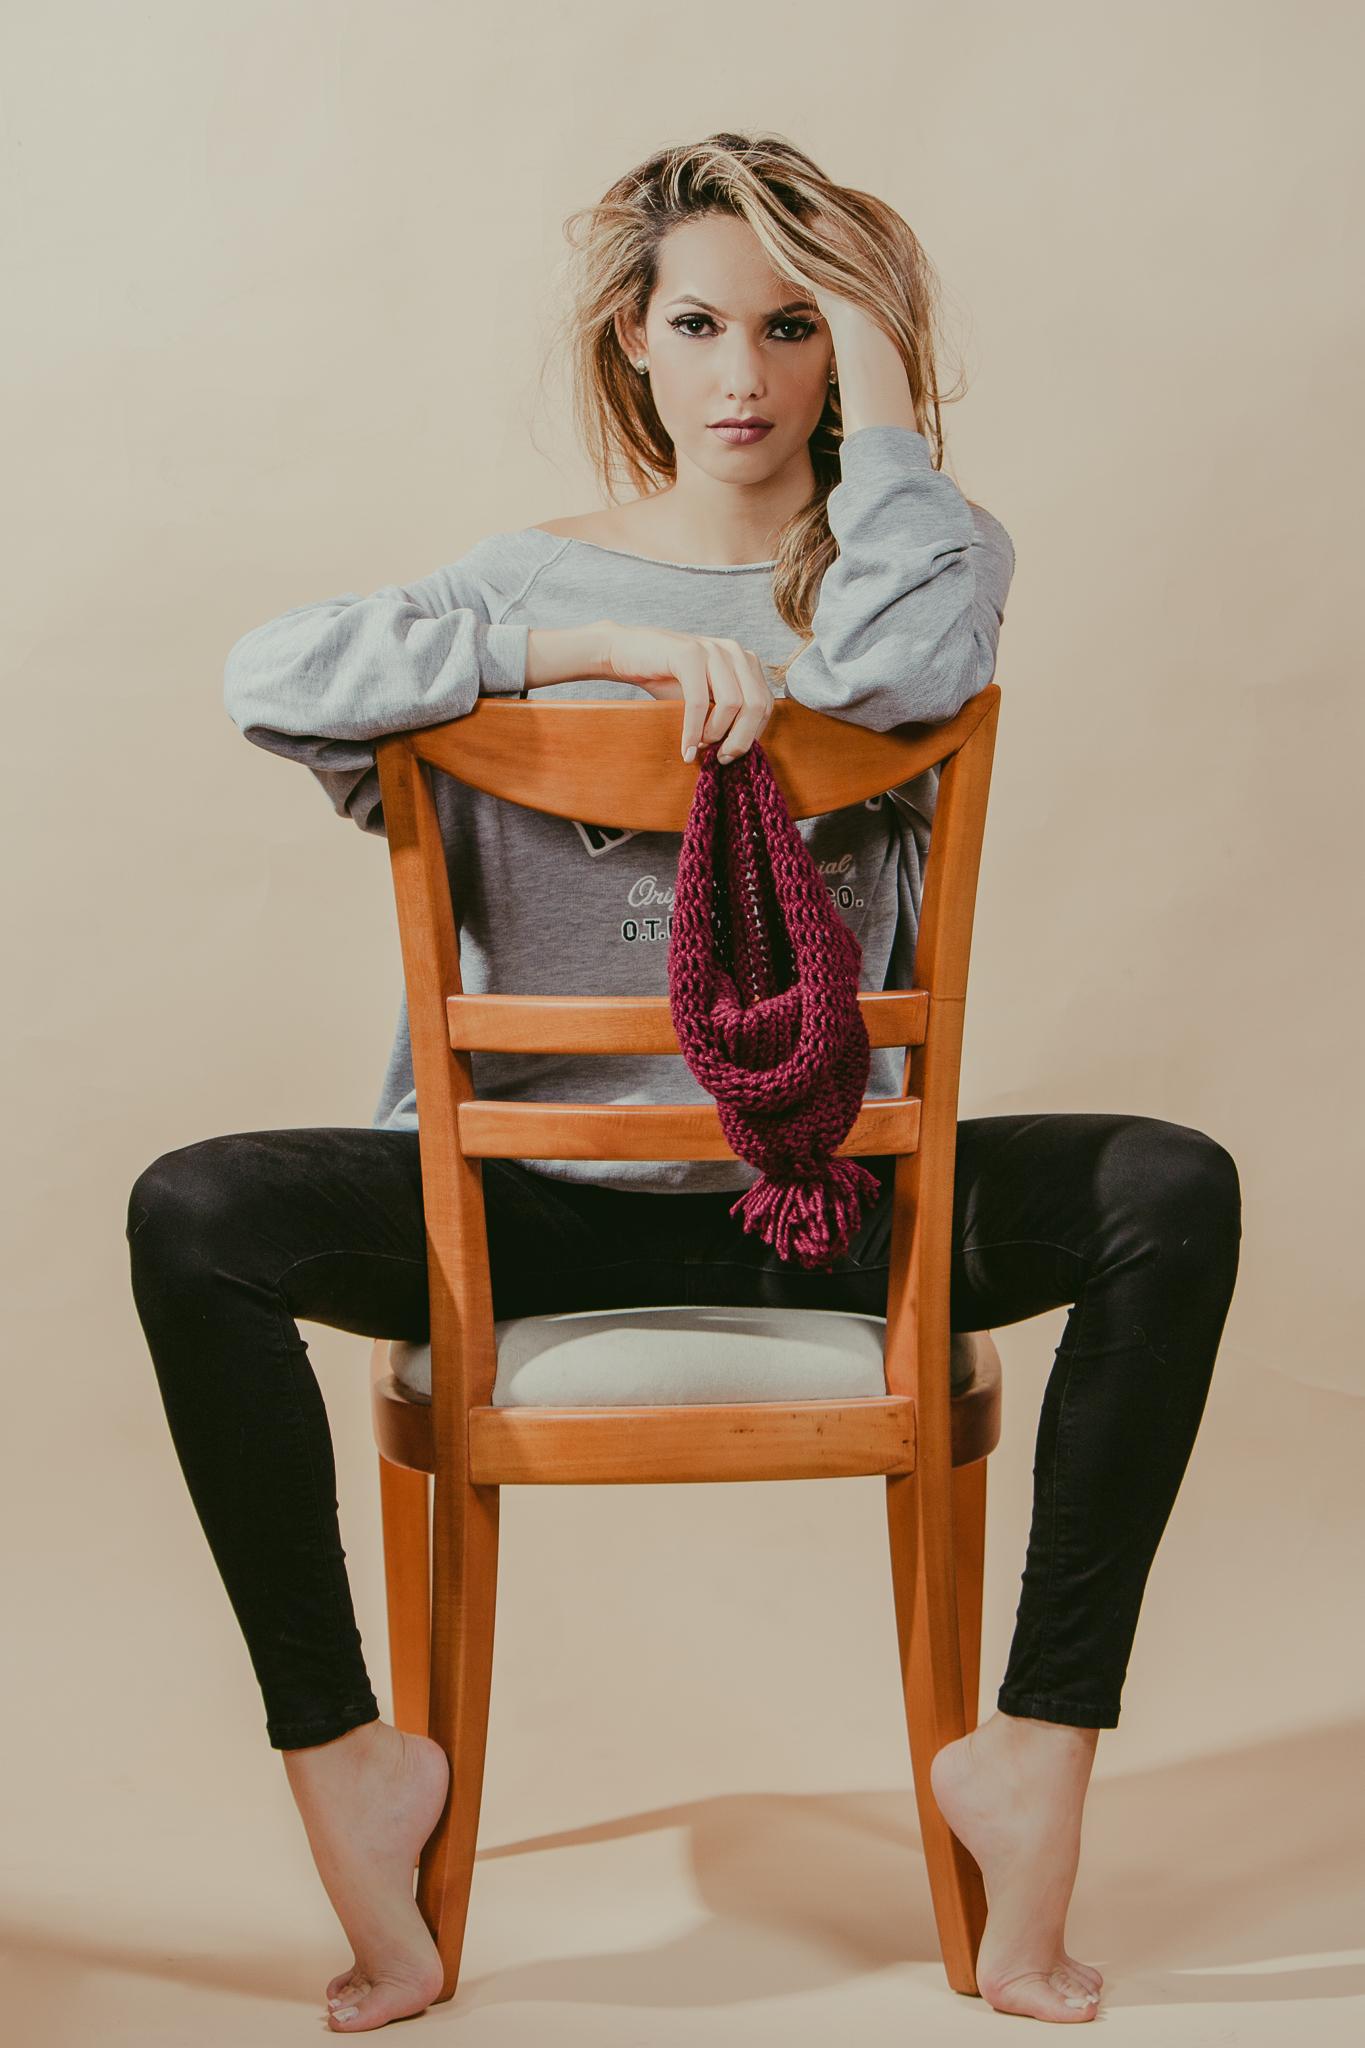 Juan-Tilve-Fashion-Photographer (1).jpg